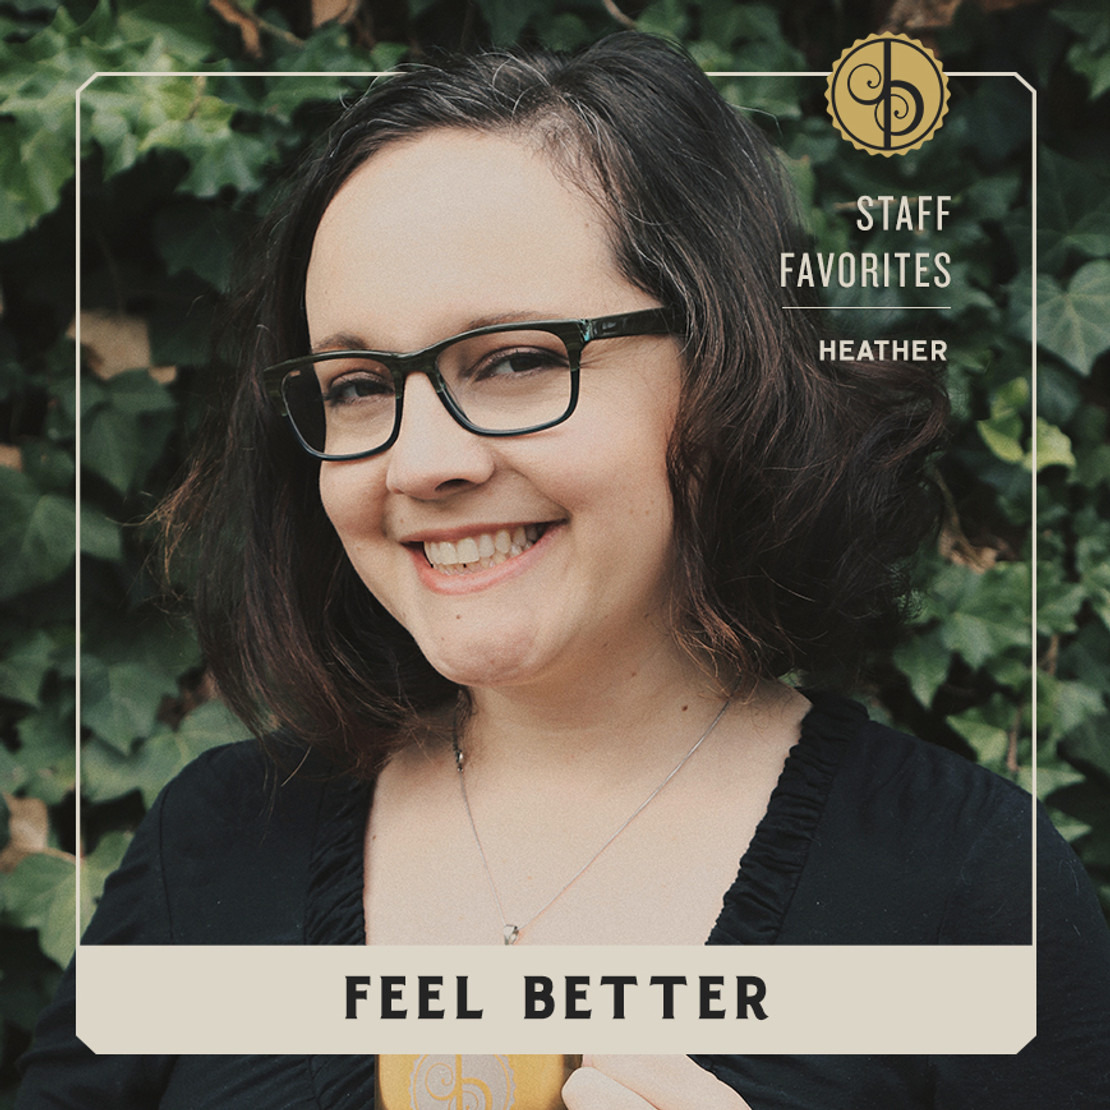 Staff Favorites: Heather & Feel Better